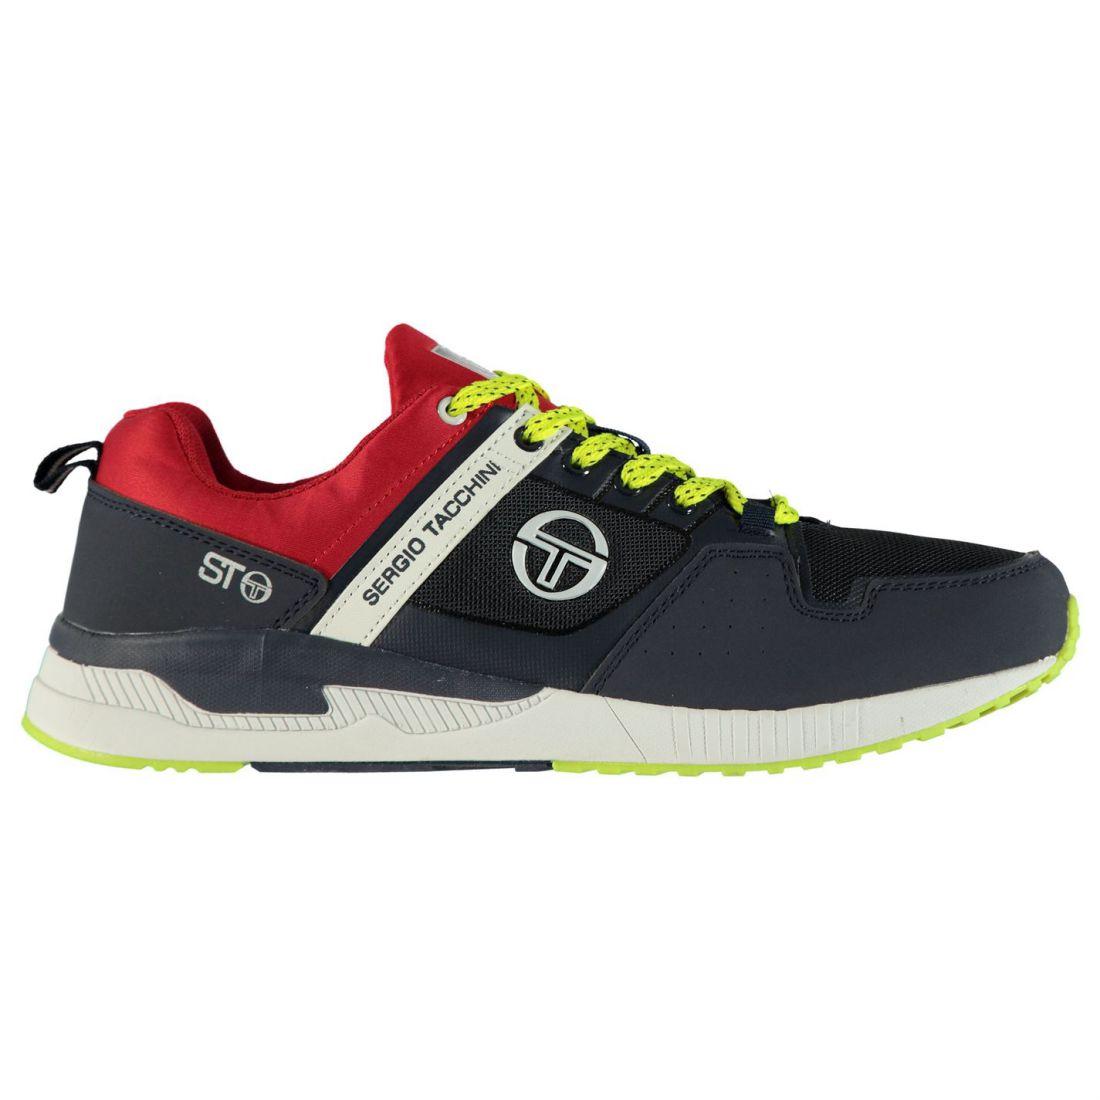 ebaec4fdaa Sergio-Tacchini-Zeus-Sneakers-Mens-Gents-Classic thumbnail 2